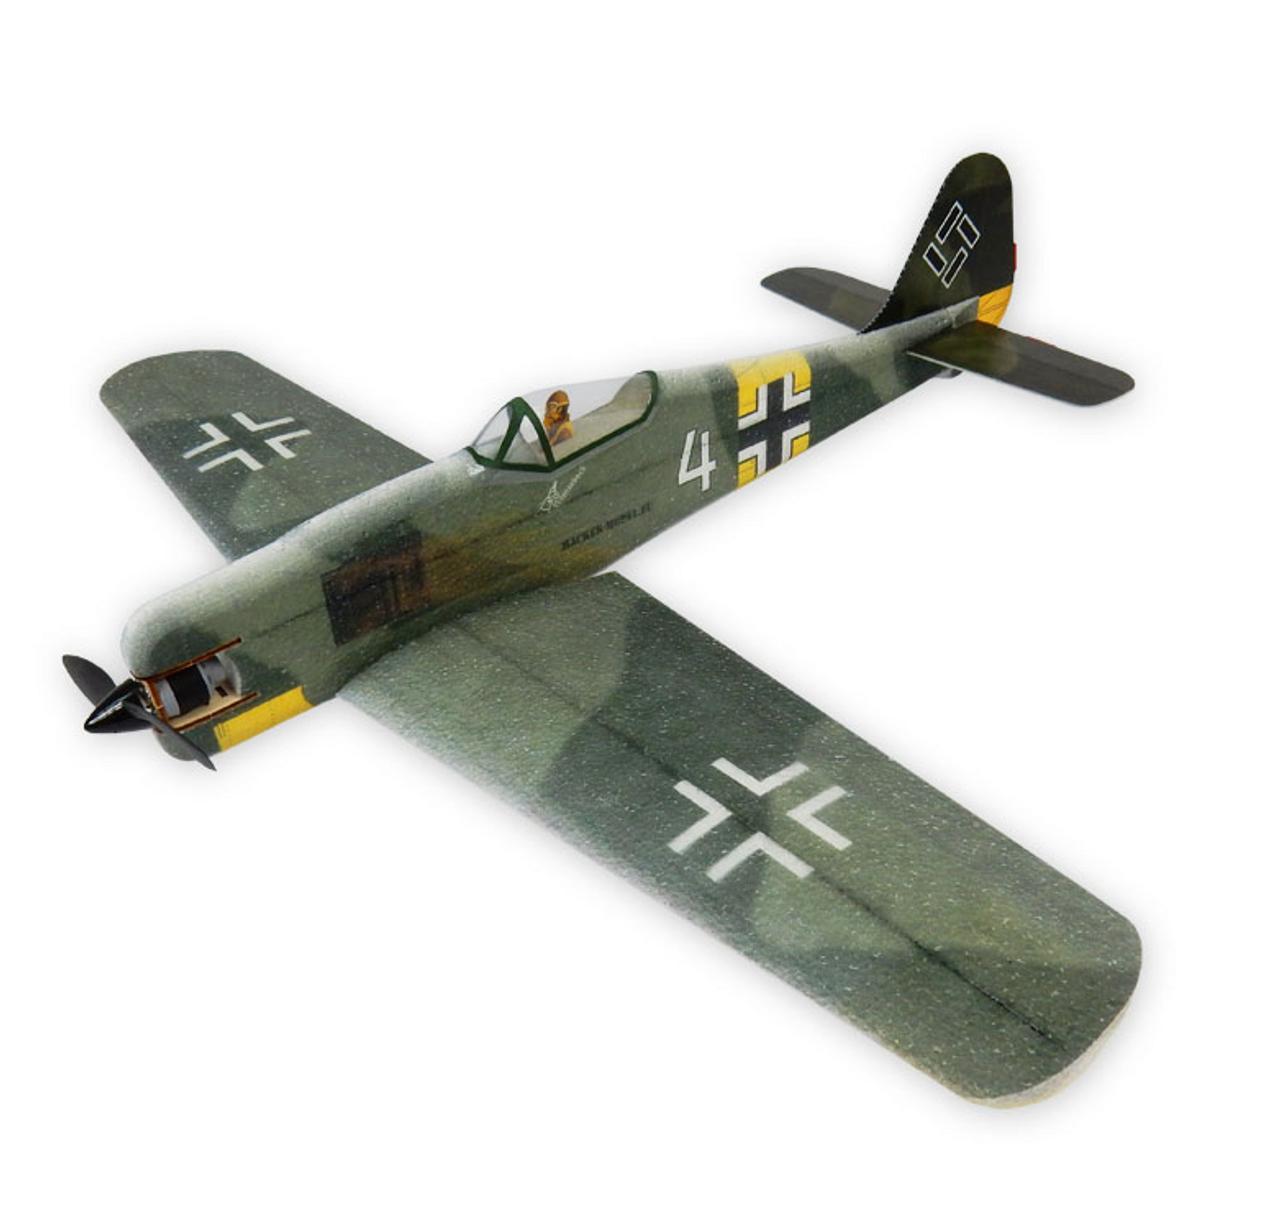 "HM 33"" EPP EPP Focke-Wulf 190A Rammbock War bird"